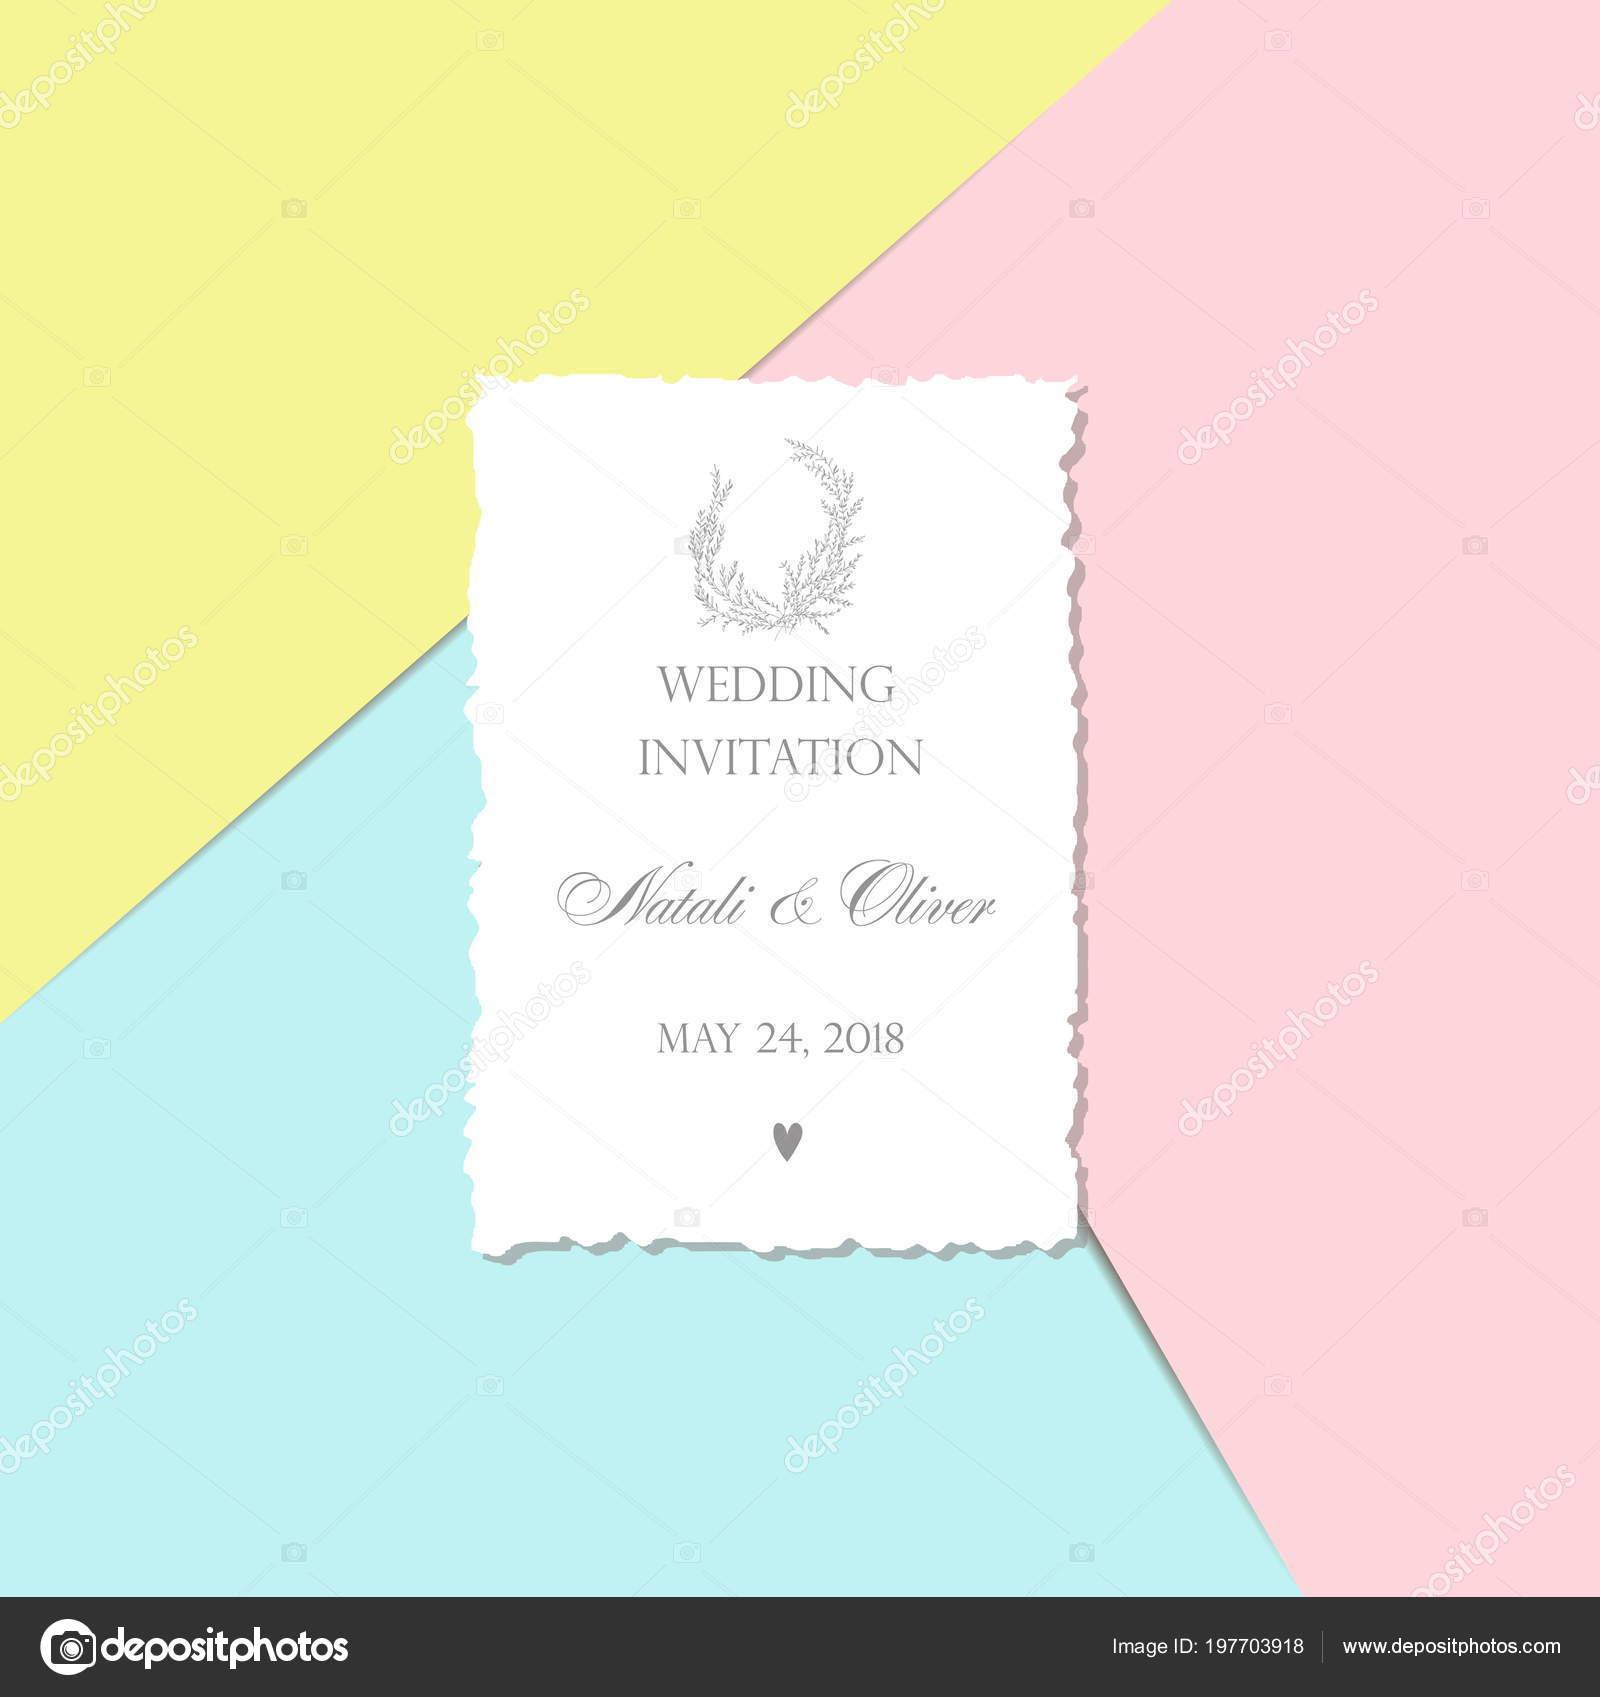 wedding invitation monogram card torn edge pink blue yellow